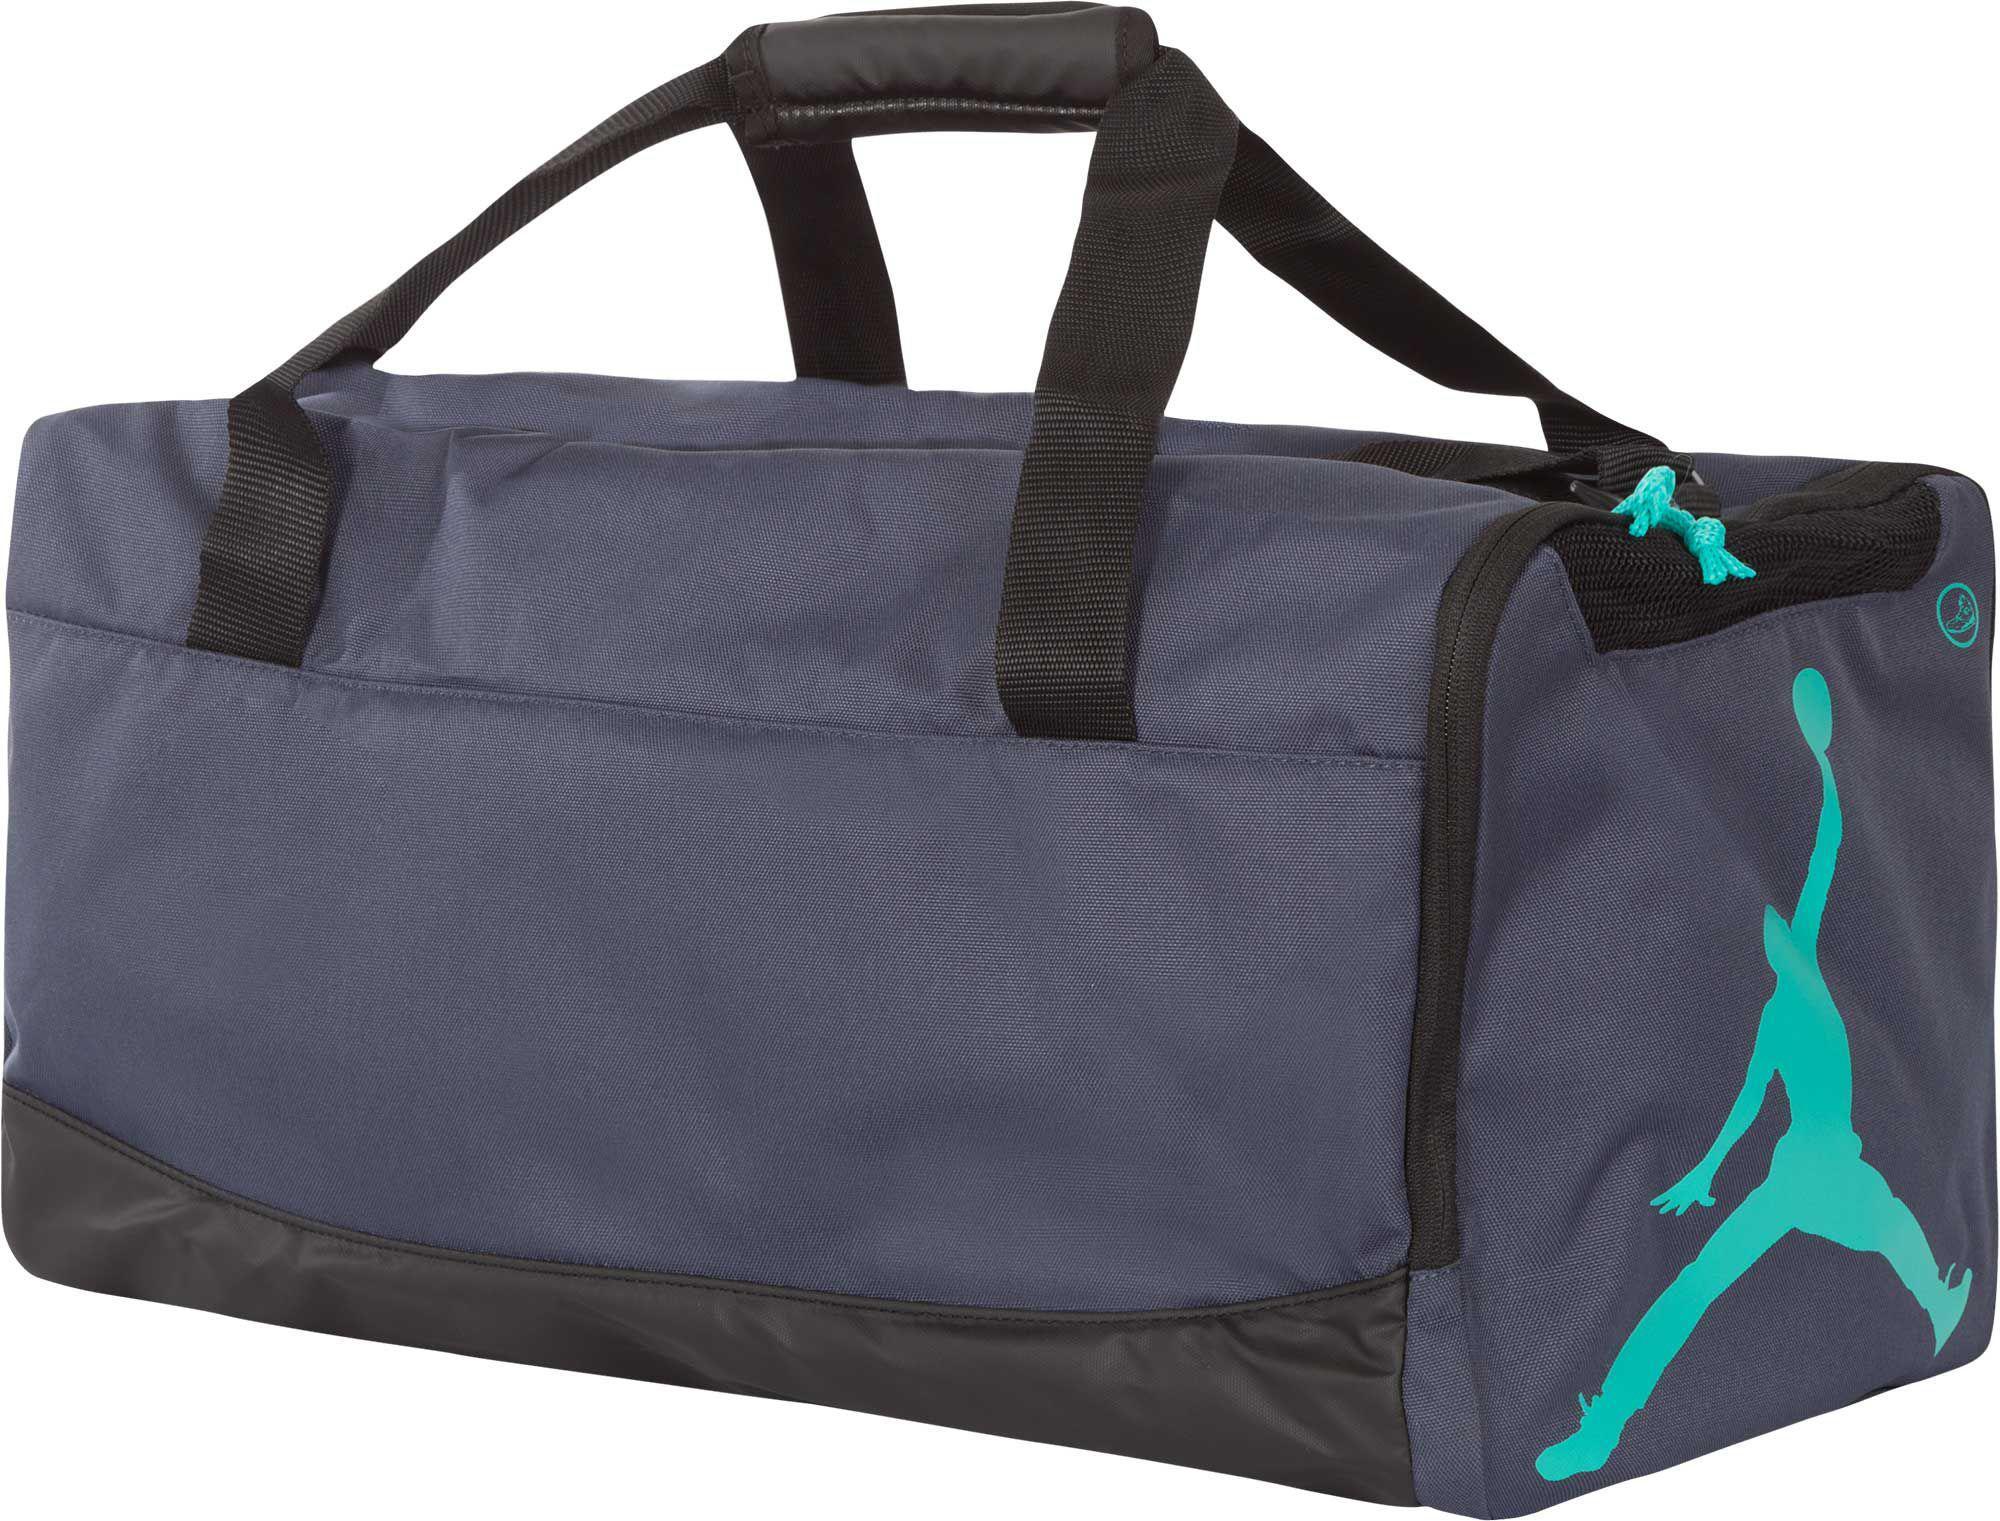 b14cd6e474 Lyst - Nike Nike Air Jumpman Trainer Medium Duffle Bag in Blue for Men